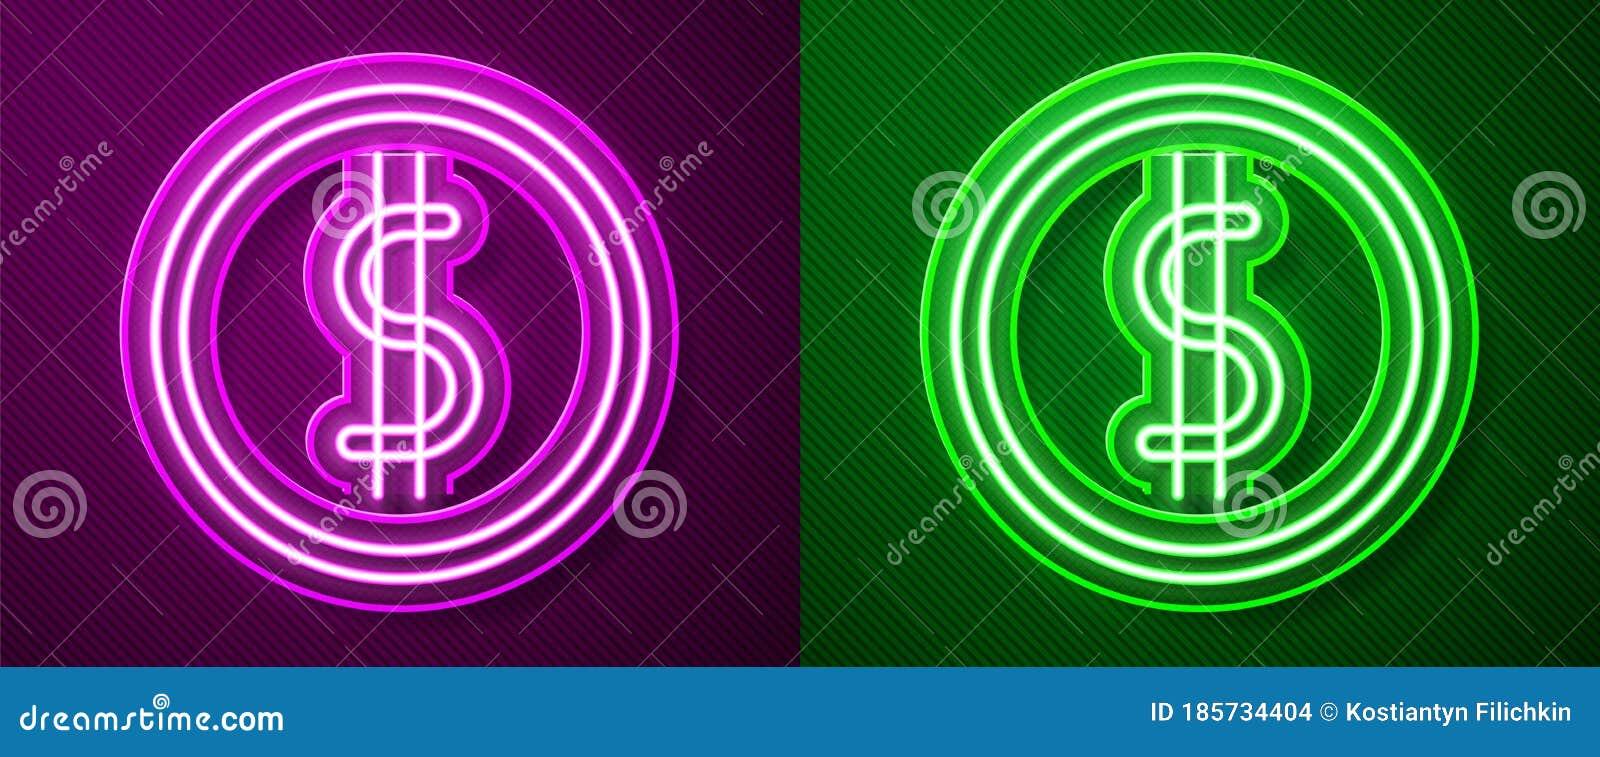 Neon Green Dollar Sign Stock Illustrations 241 Neon Green Dollar Sign Stock Illustrations Vectors Clipart Dreamstime